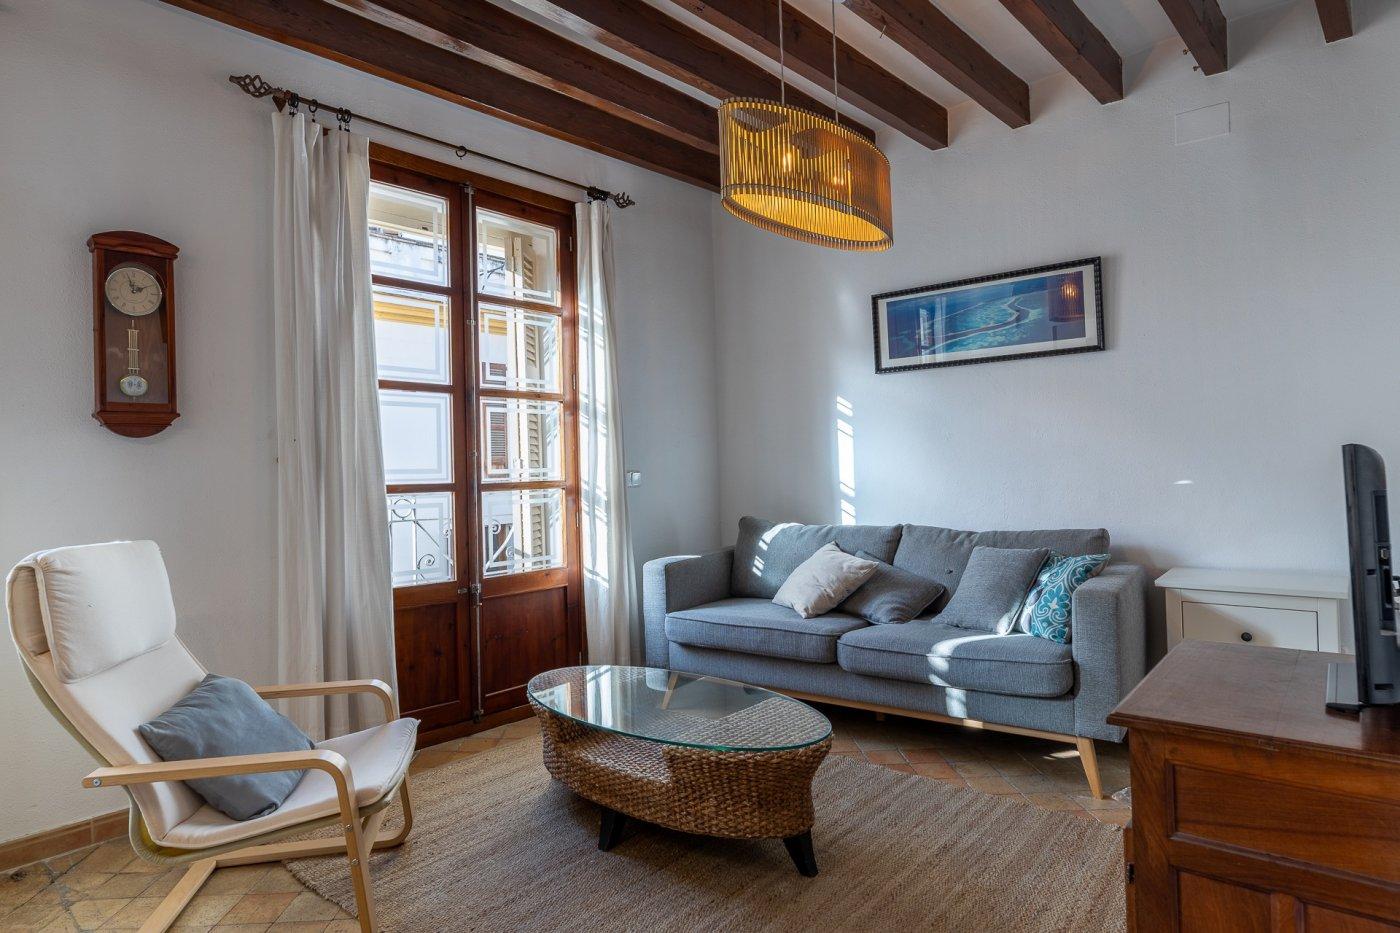 Espectacular apartamento en centro de palma - imagenInmueble21